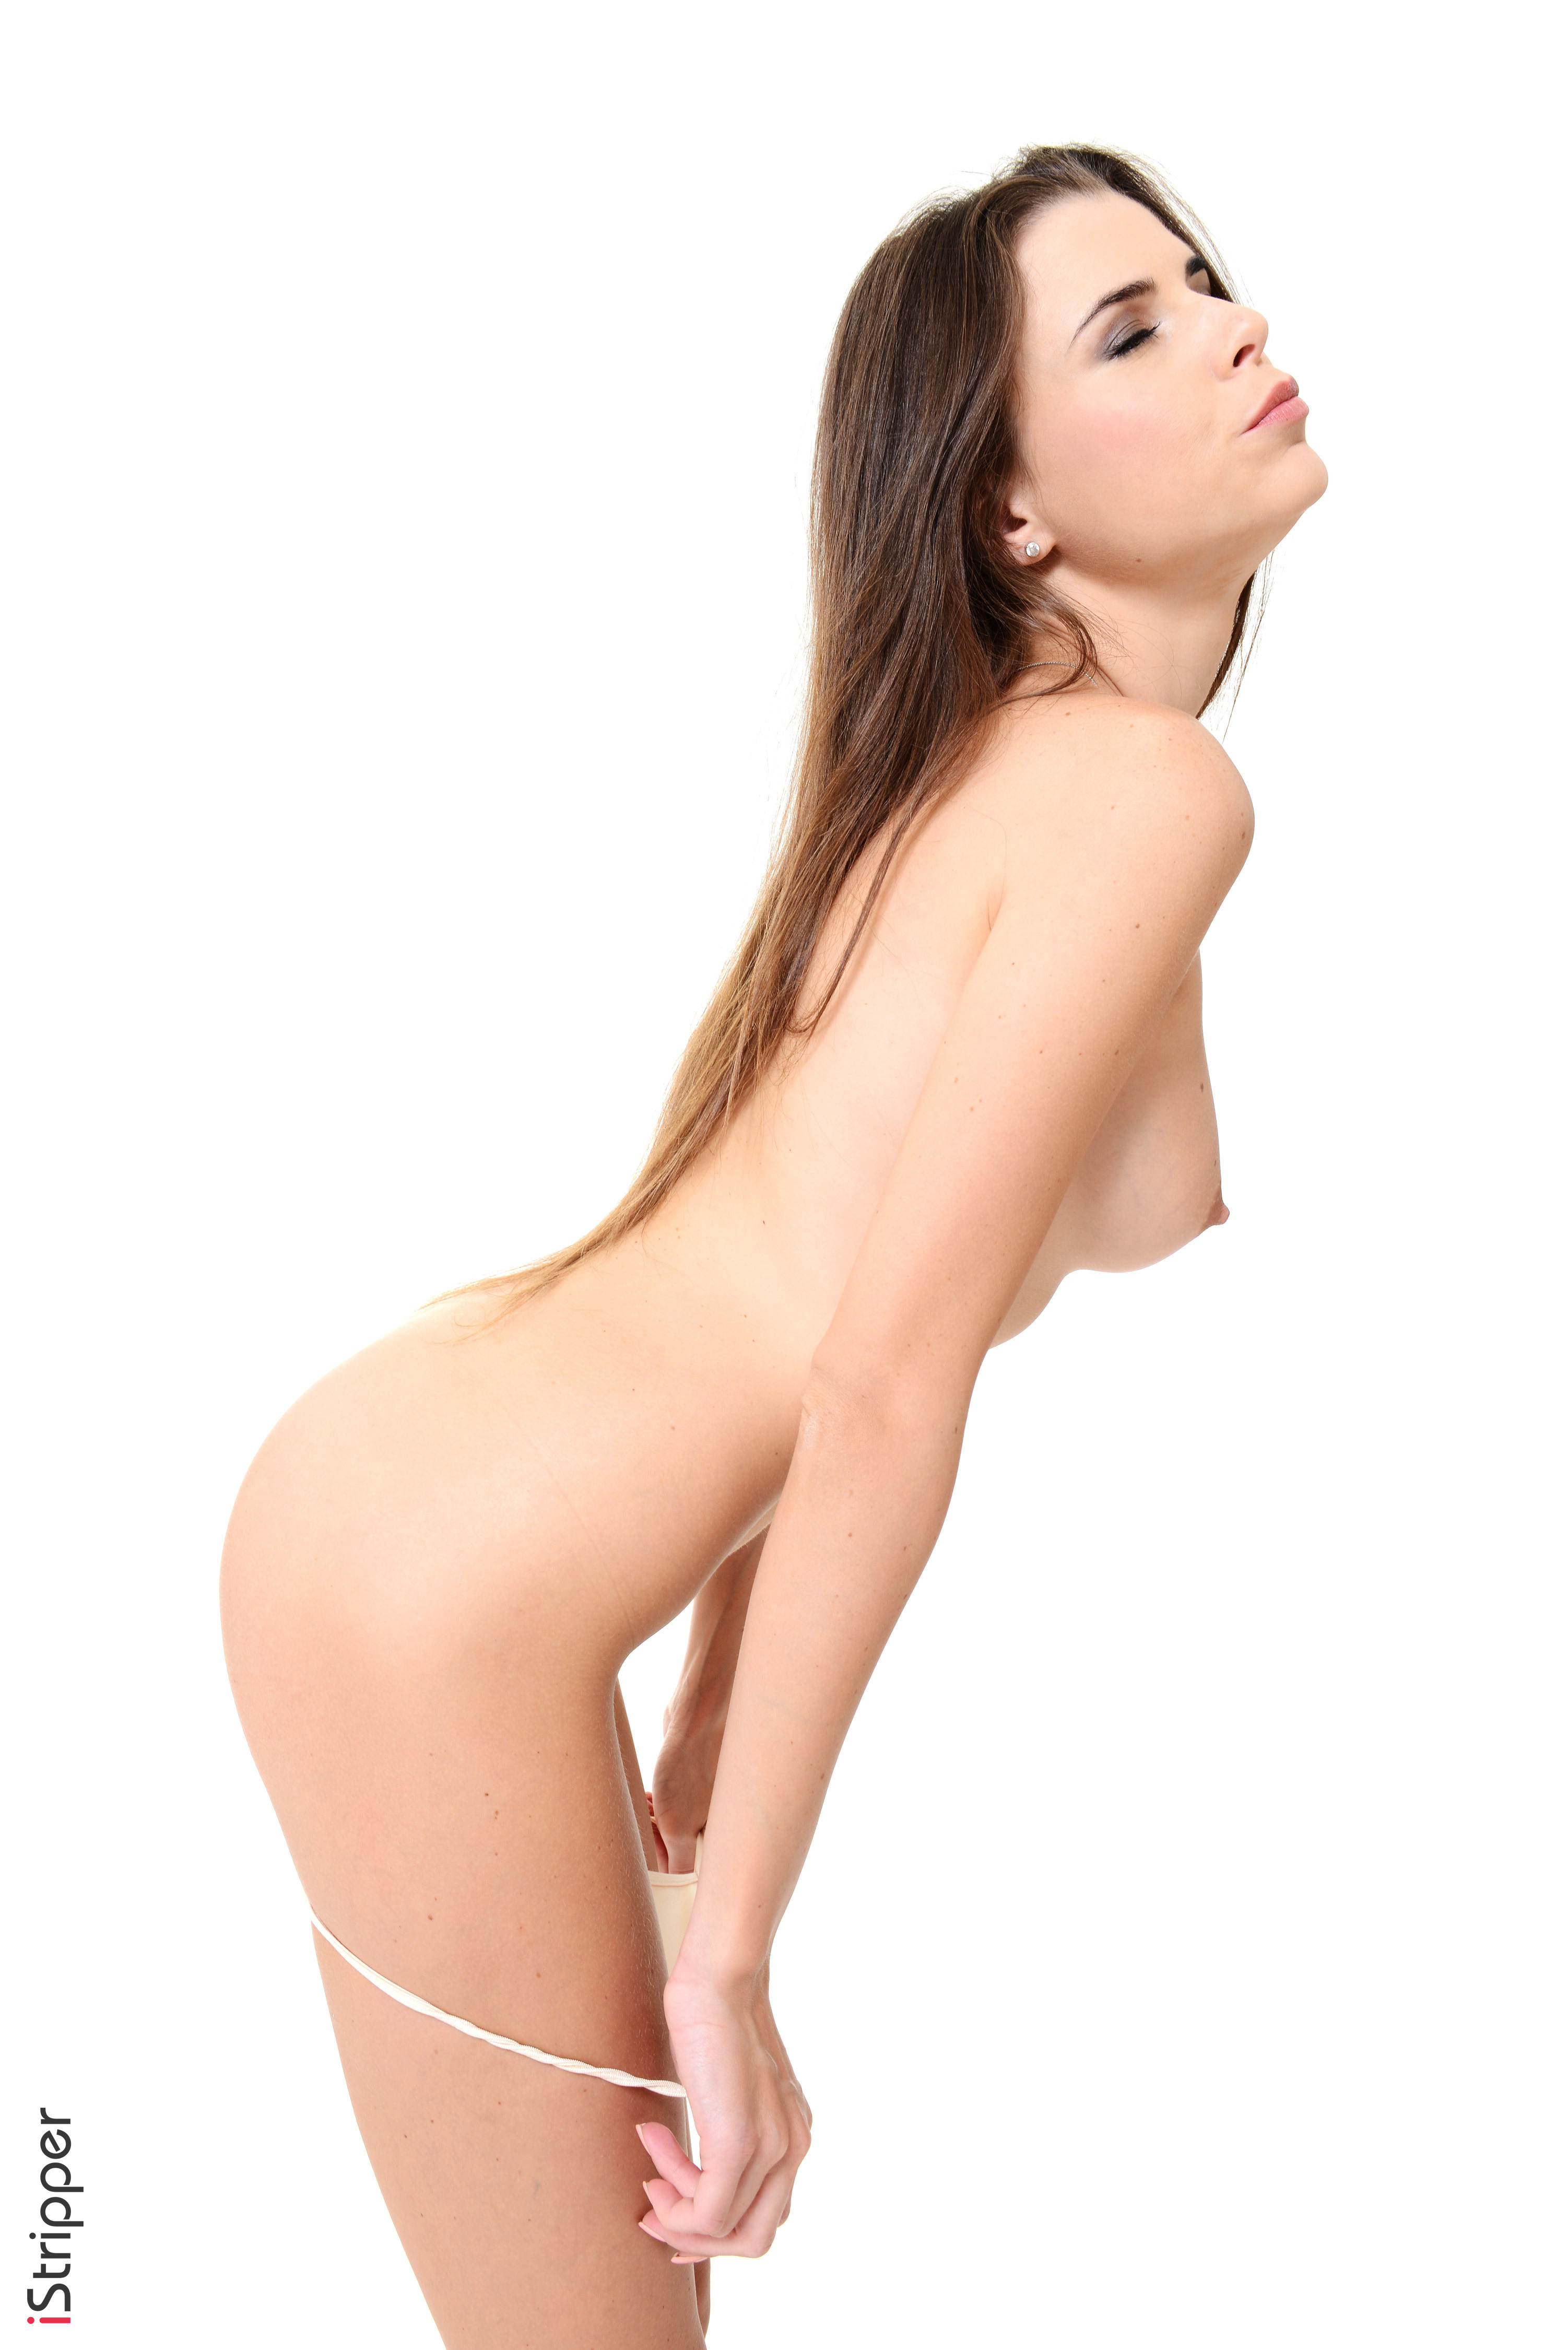 free big boobs desktop stripper